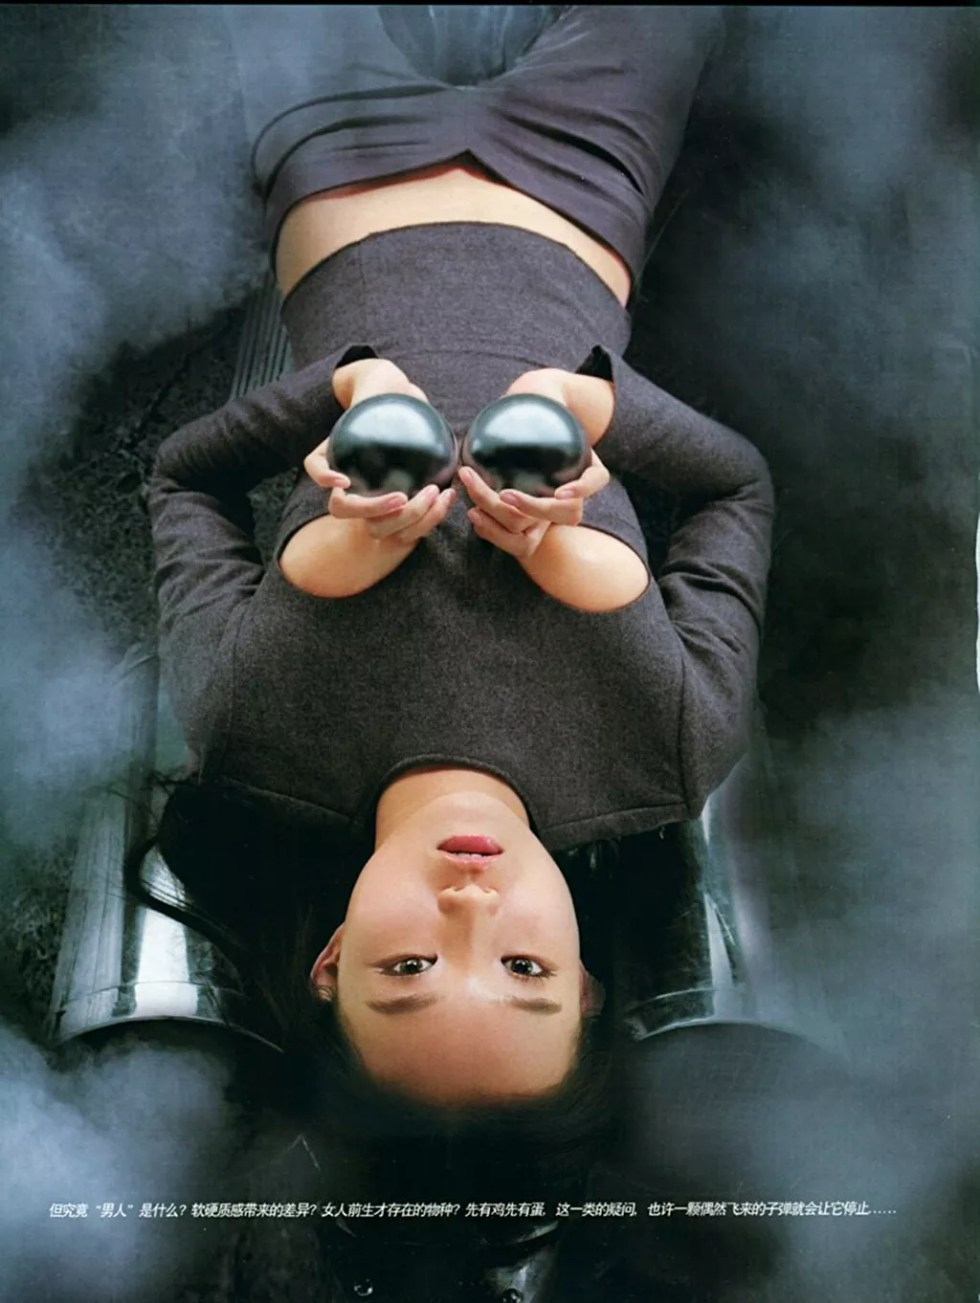 Photographer Chen Zhun's Photo Erotic Novel 02